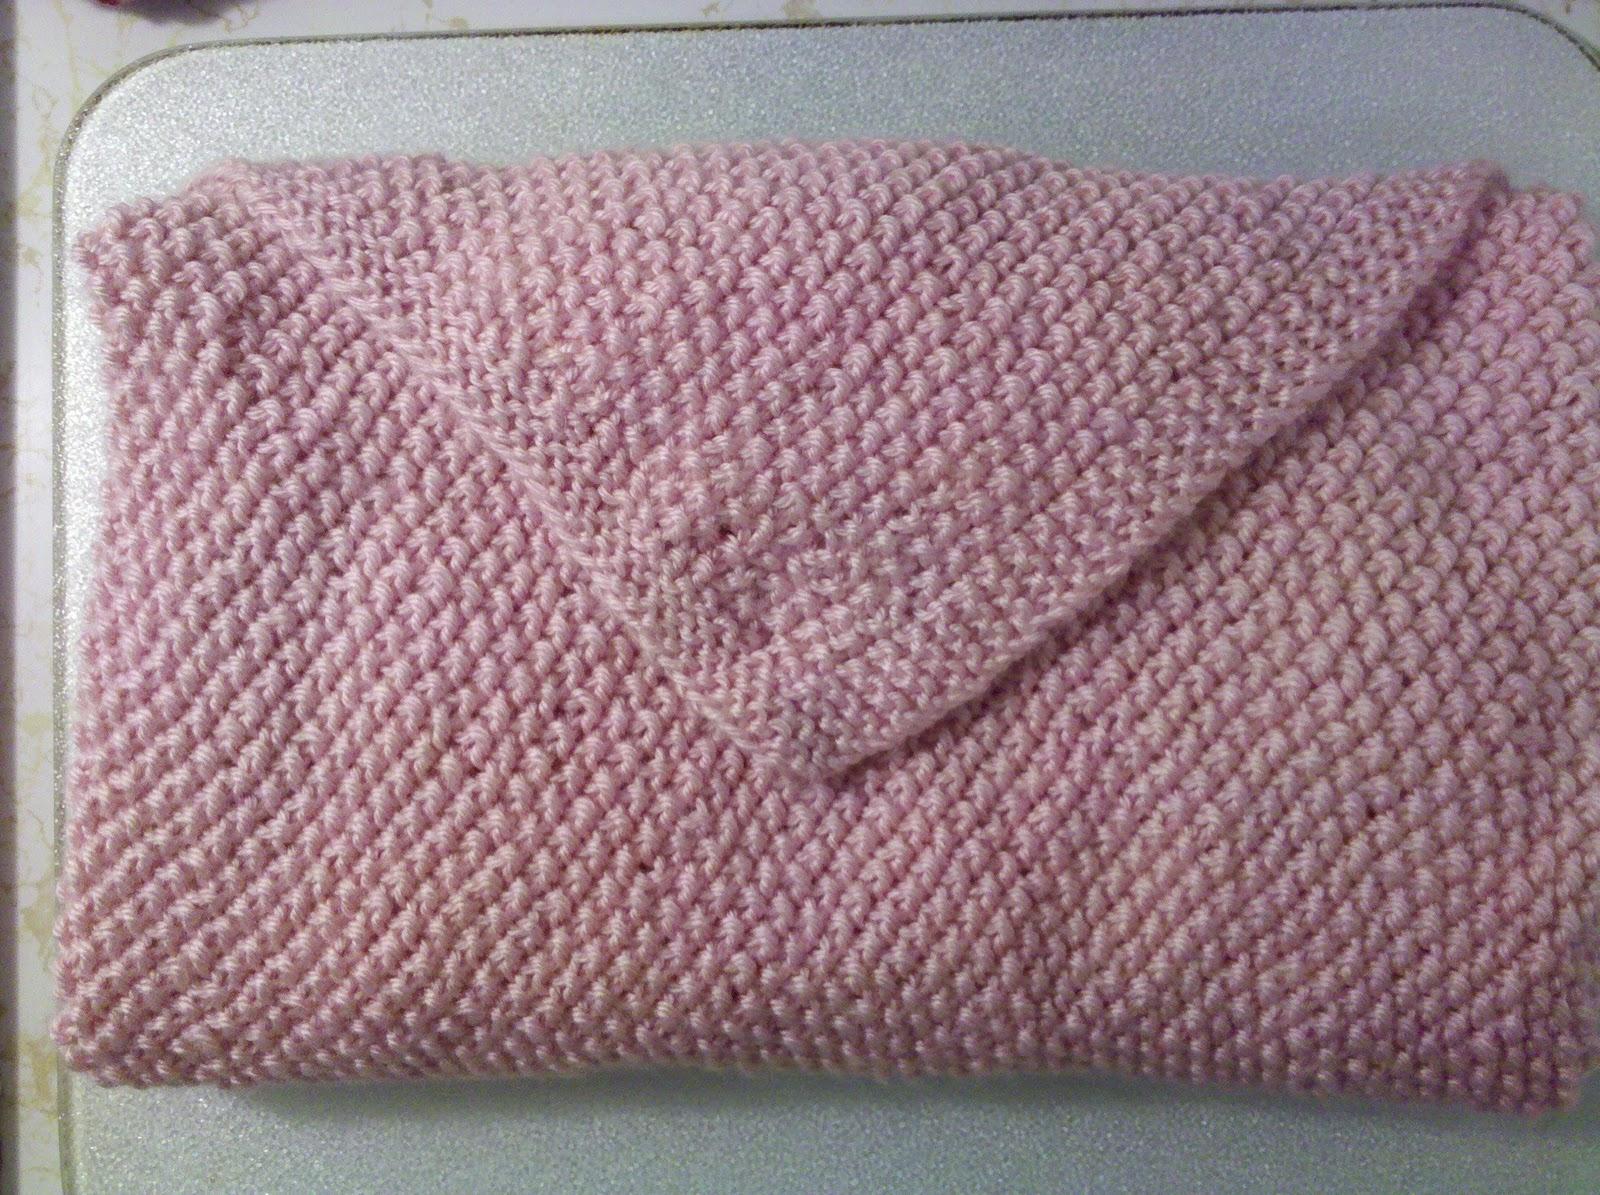 Knitting Pattern Small Baby Blanket : Boston Handmade: My next knitting project- a baby blanket ...